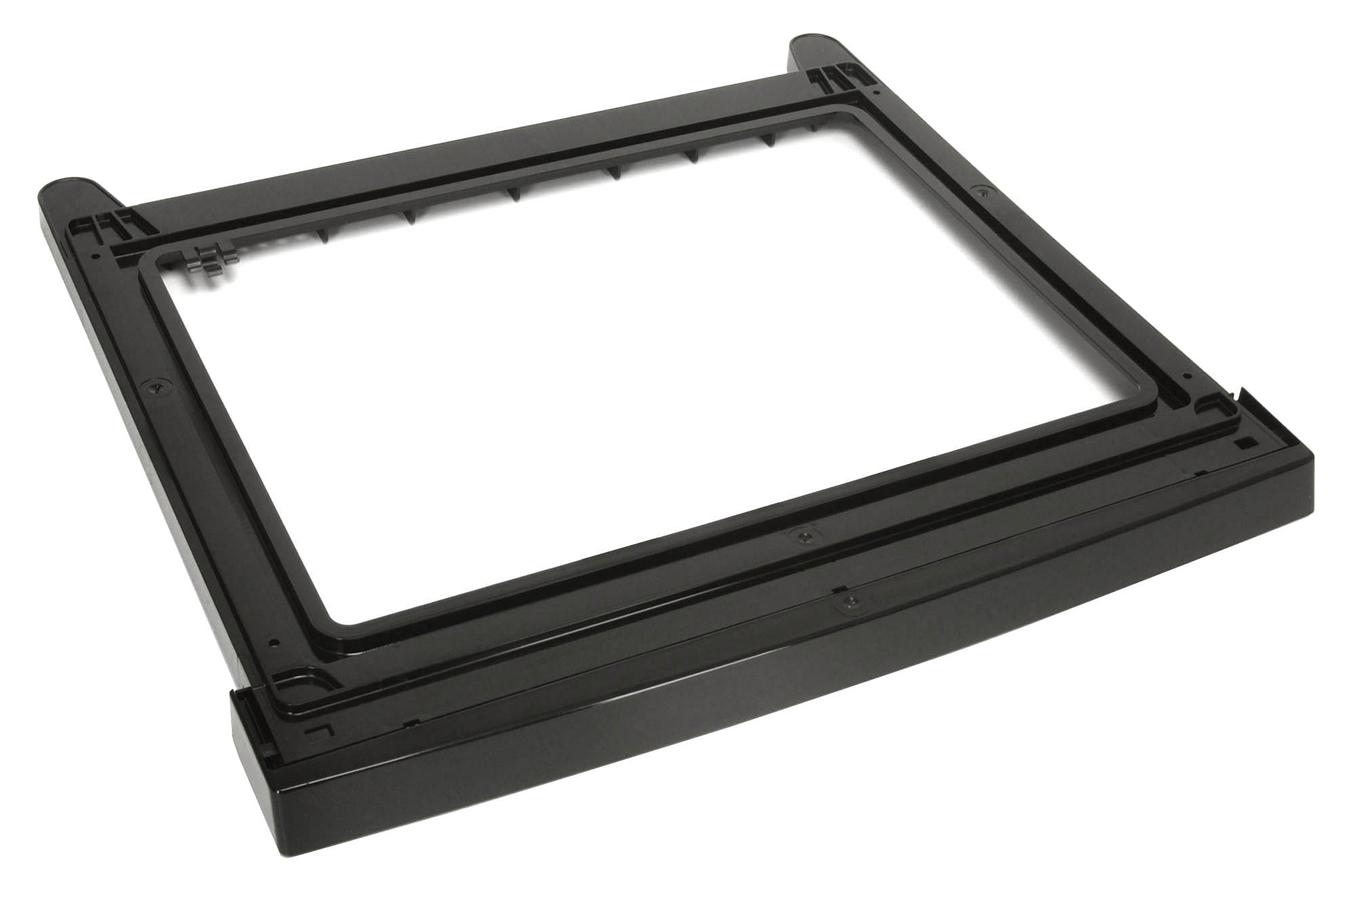 kit de superposition bosch wtz 11320 s tab wtz11320 2561620 darty. Black Bedroom Furniture Sets. Home Design Ideas